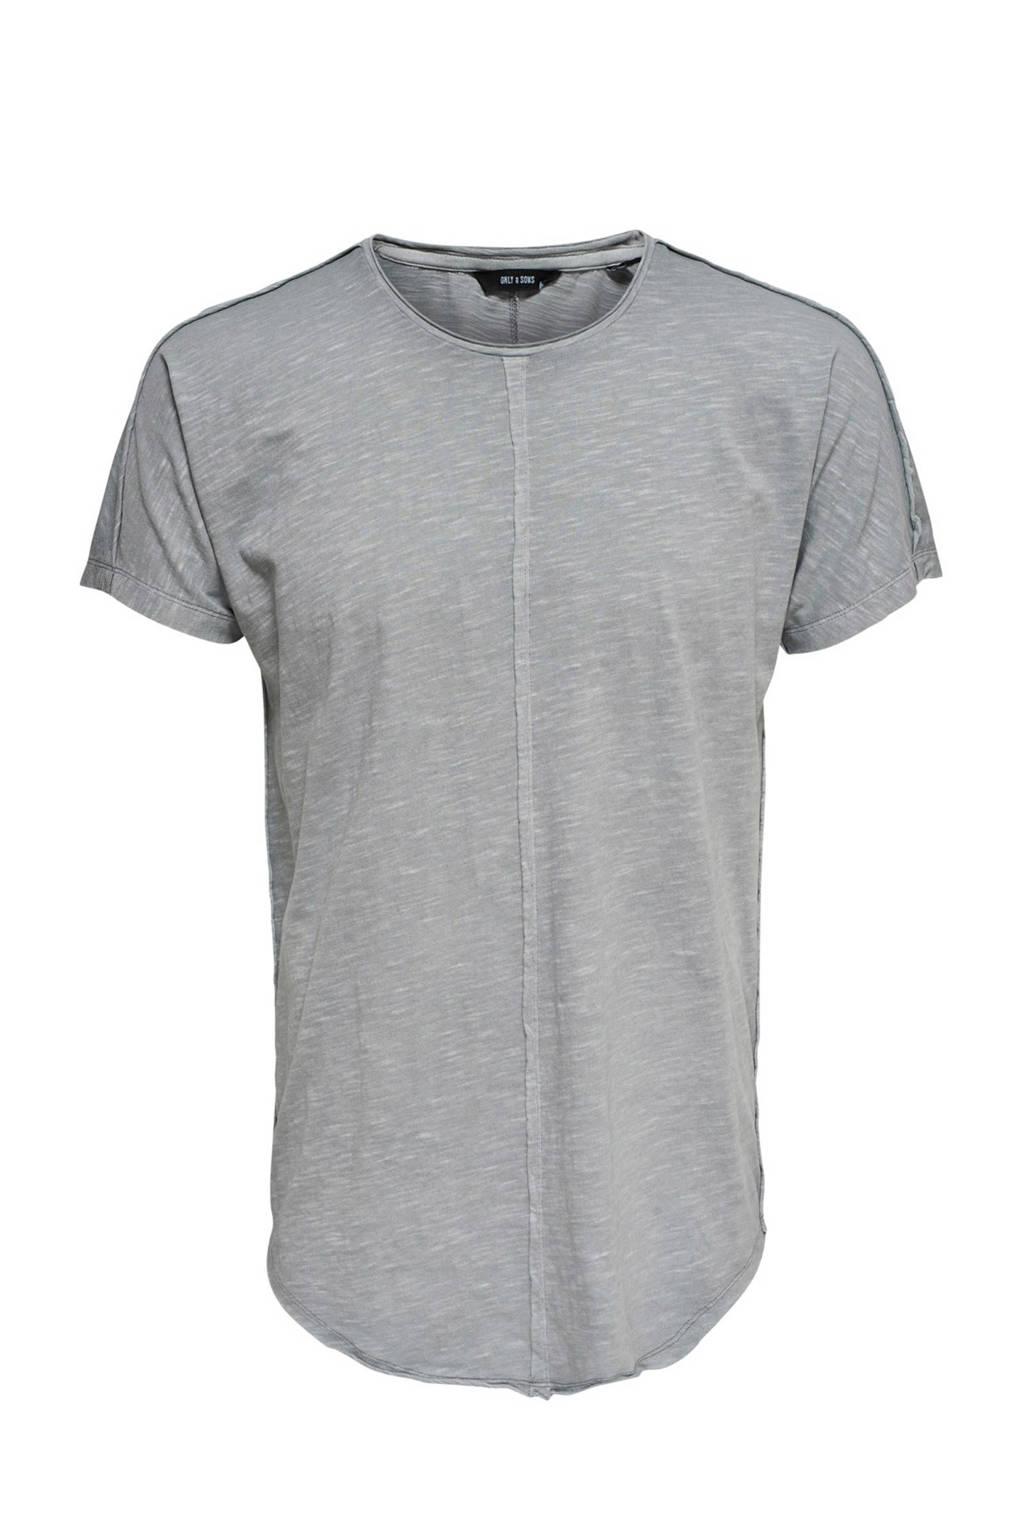 Only & Sons T-shirt, Grijs